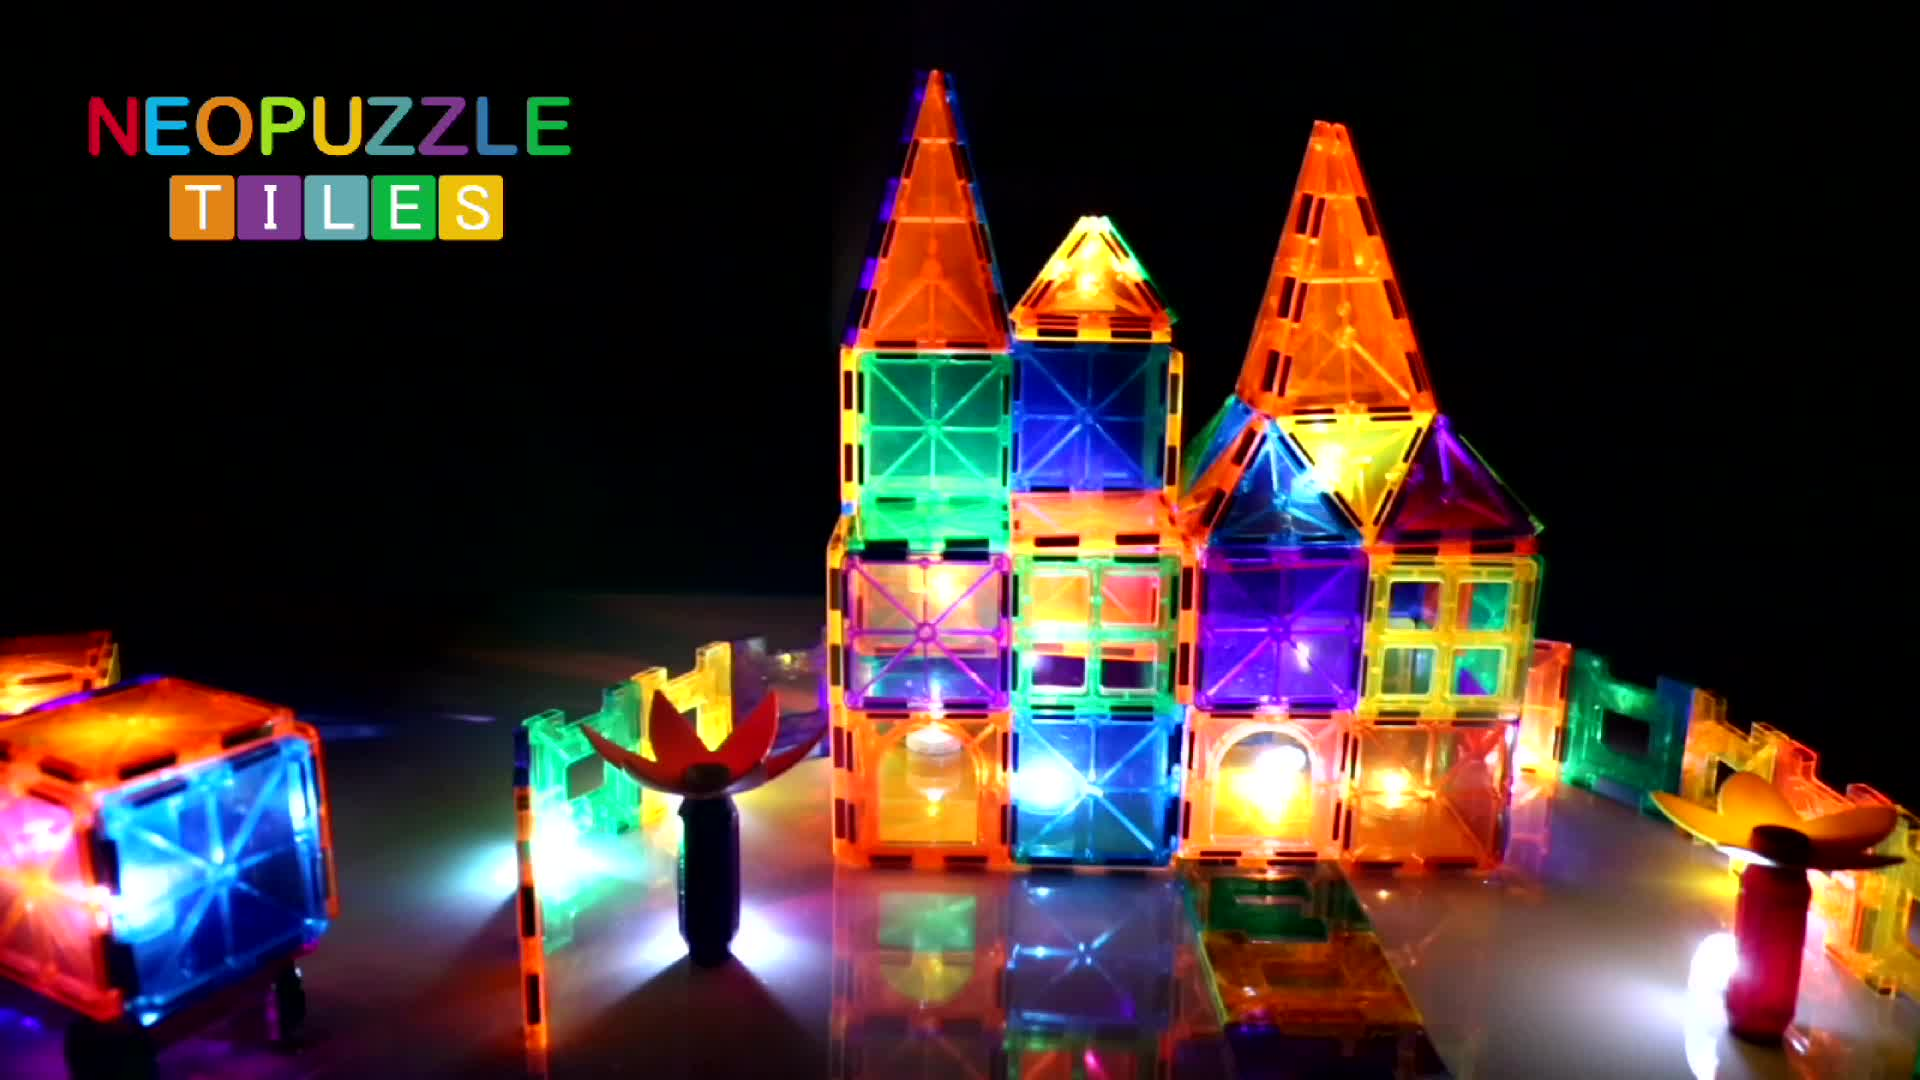 Amazon building block supplier Educational Toy creative construction toy wholesale magnetic tiles building set magna tiles